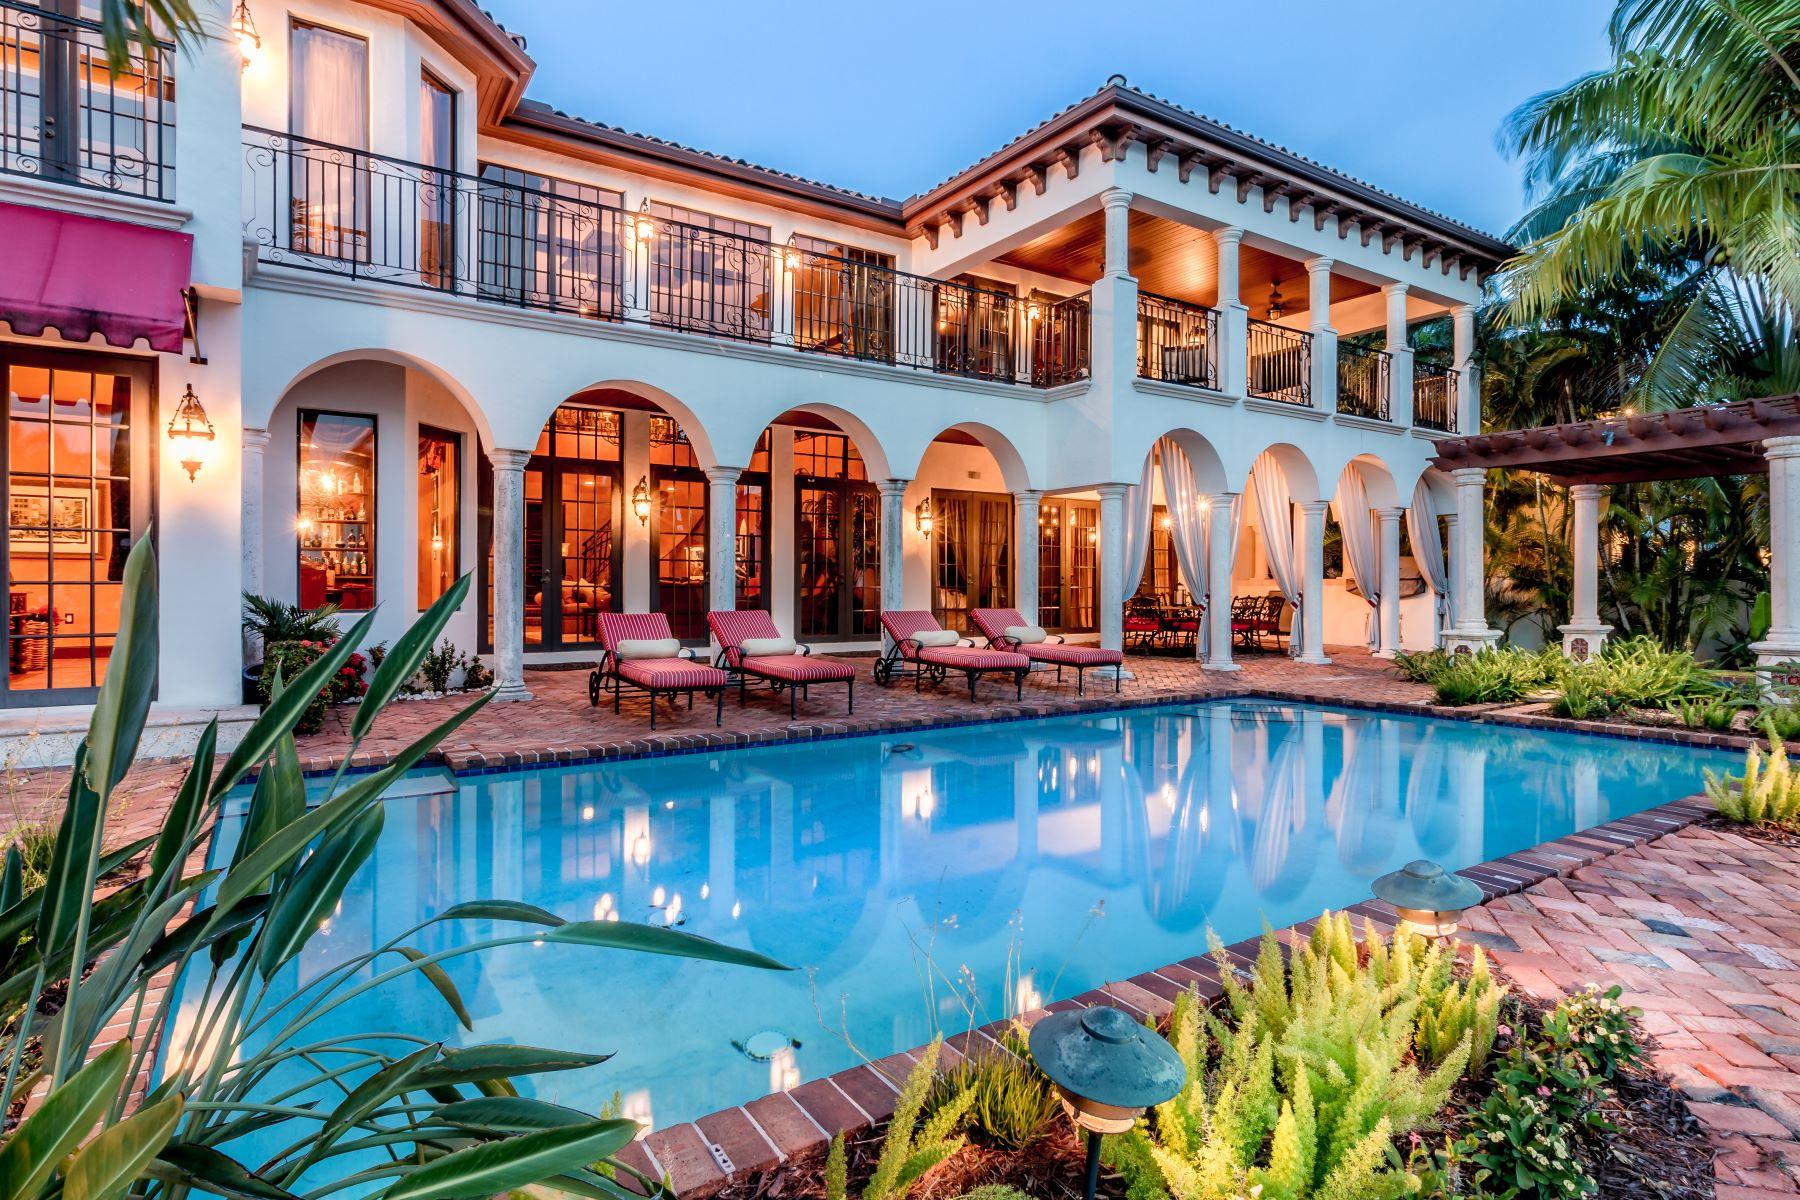 Villa per Vendita alle ore 517 Isle Of Palms Dr Fort Lauderdale, Florida, 33301 Stati Uniti